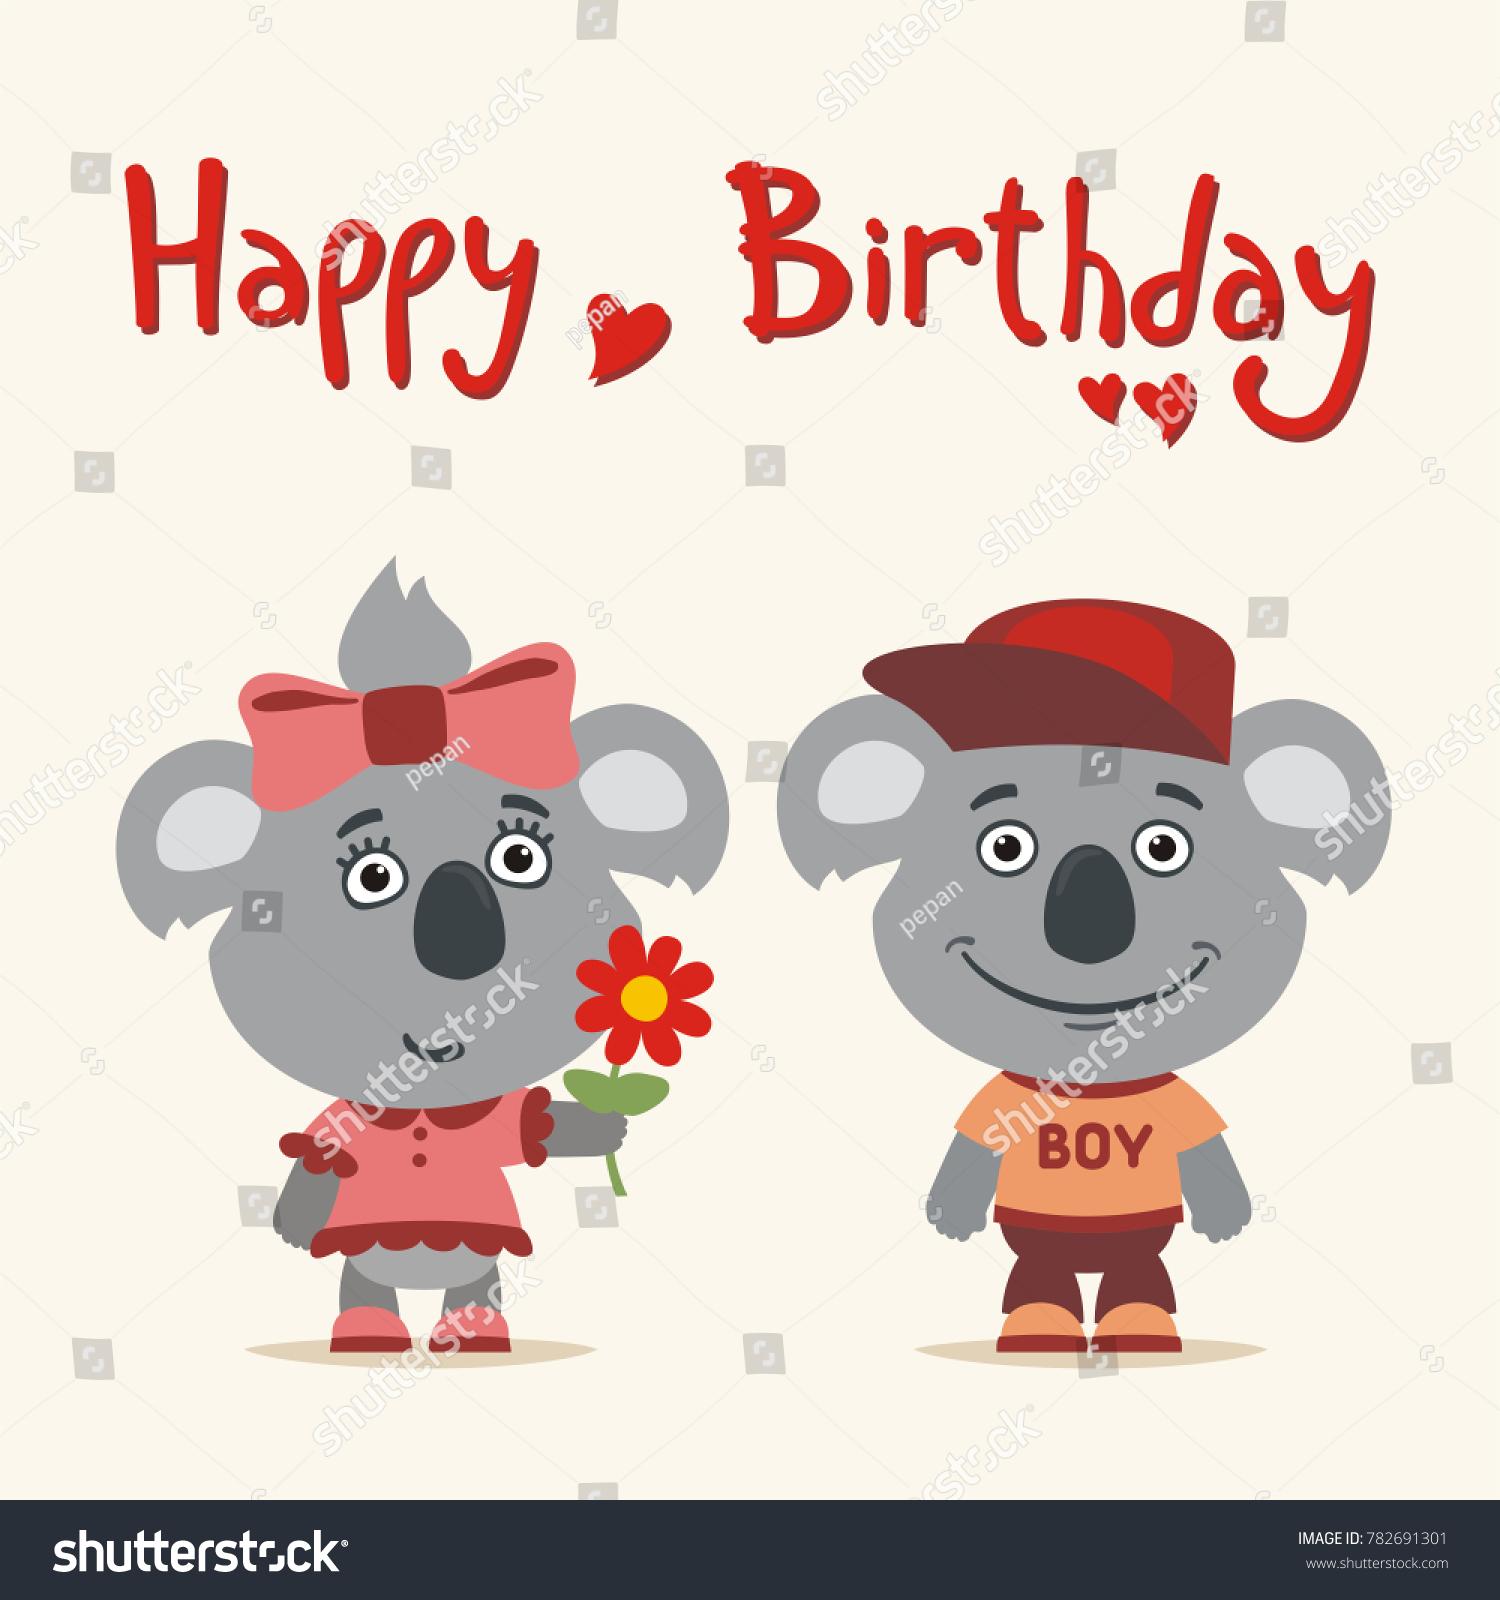 Happy birthday greeting card funny koala stock vector 782691301 happy birthday greeting card funny koala girl gives gift to boy koala for birthday bookmarktalkfo Images